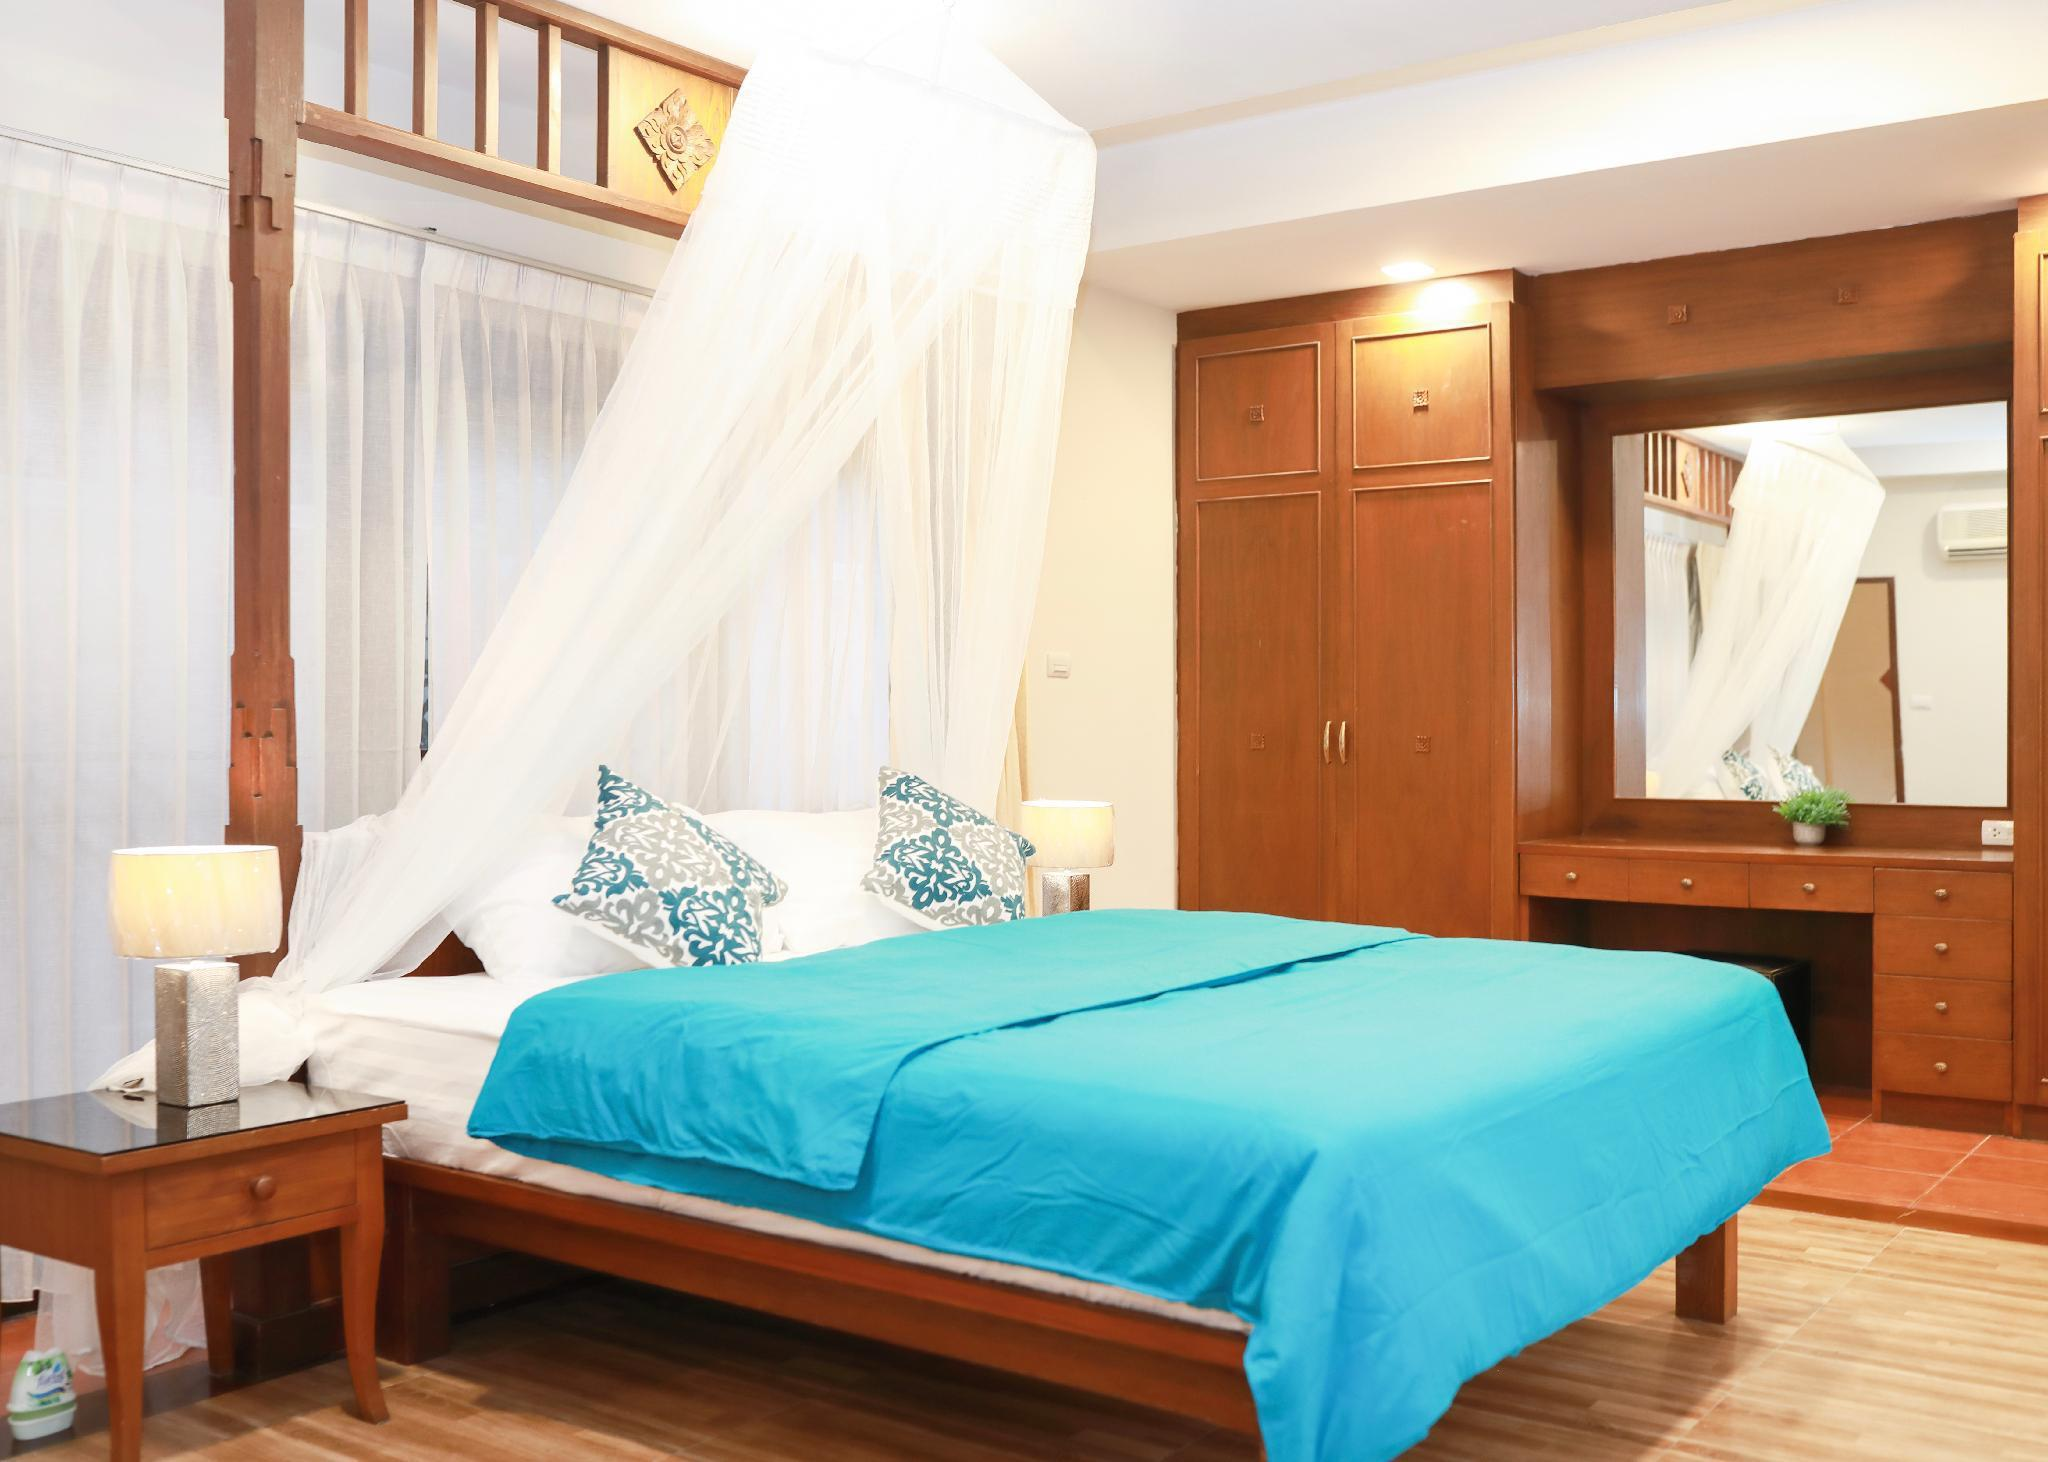 Super large pool luxury villa by pattaya วิลลา 3 ห้องนอน 3 ห้องน้ำส่วนตัว ขนาด 280 ตร.ม. – เขาพระตำหนัก